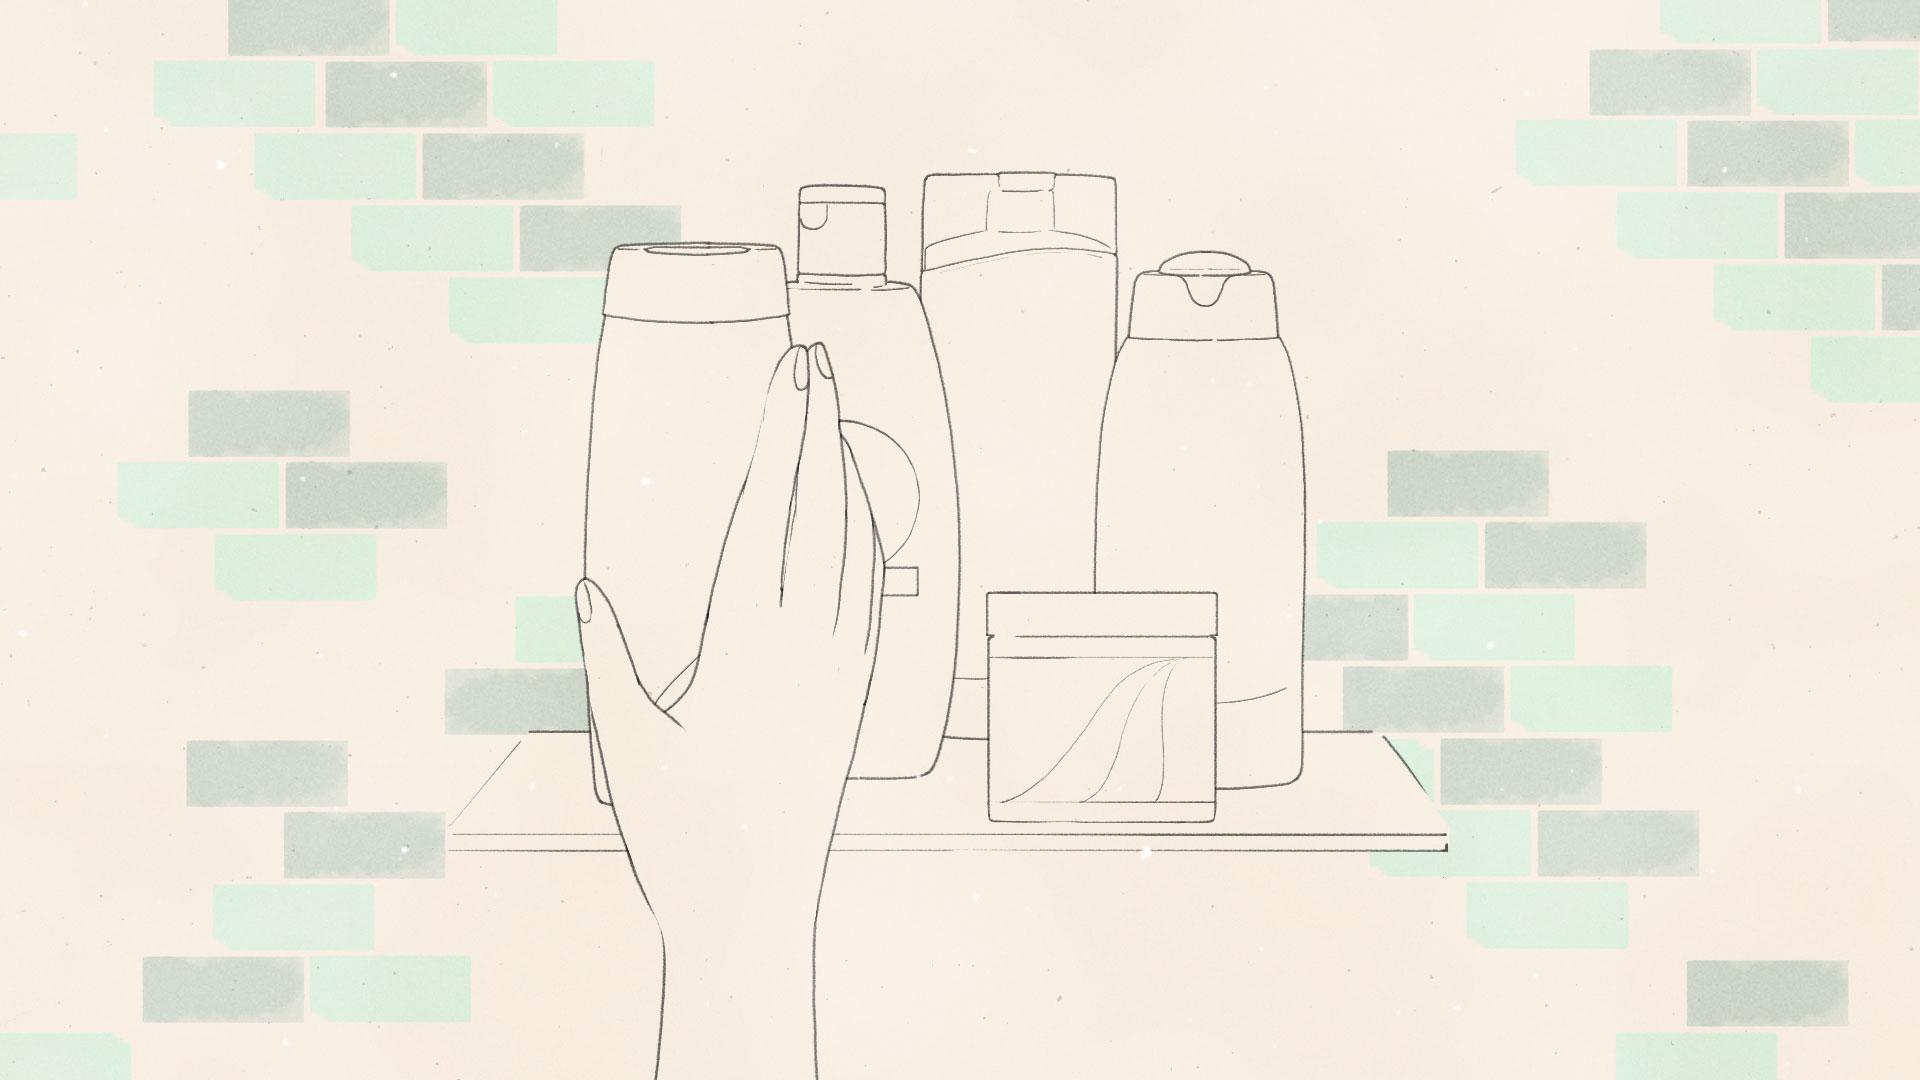 Unwash - The New Clean Still 03